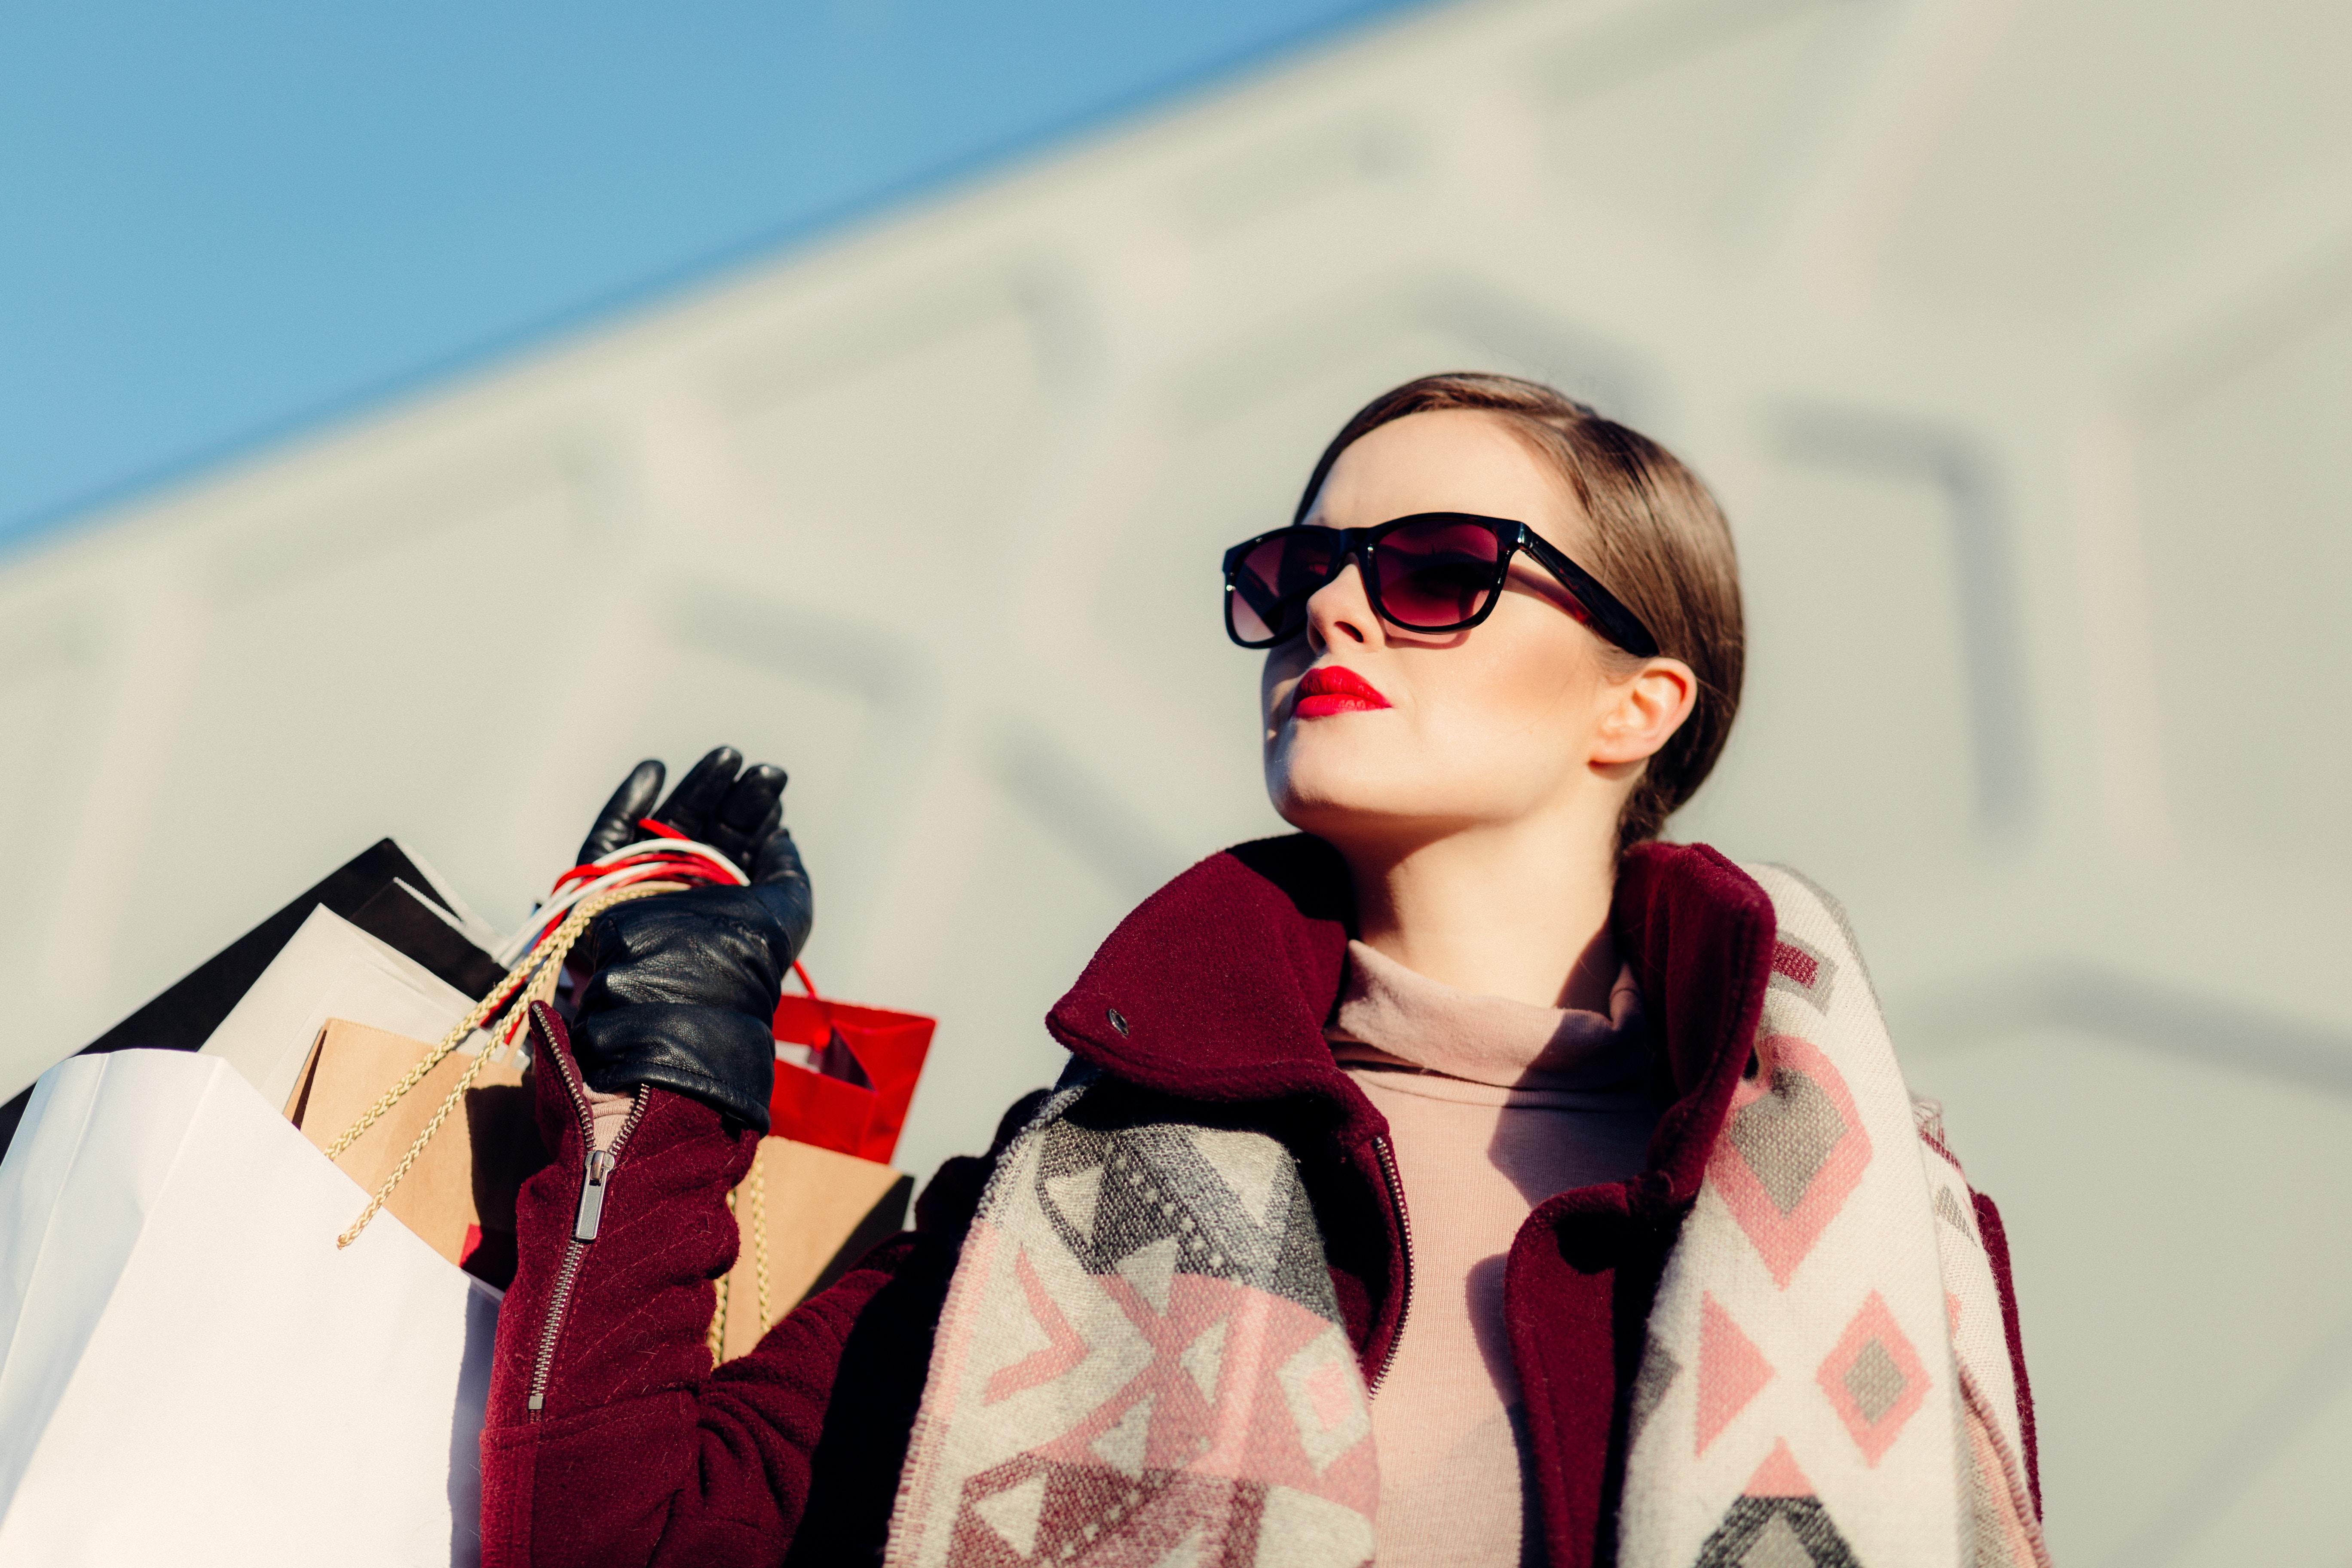 Blog Modemuze Judith van Hilten. Photo by freestocks.org on Unsplash